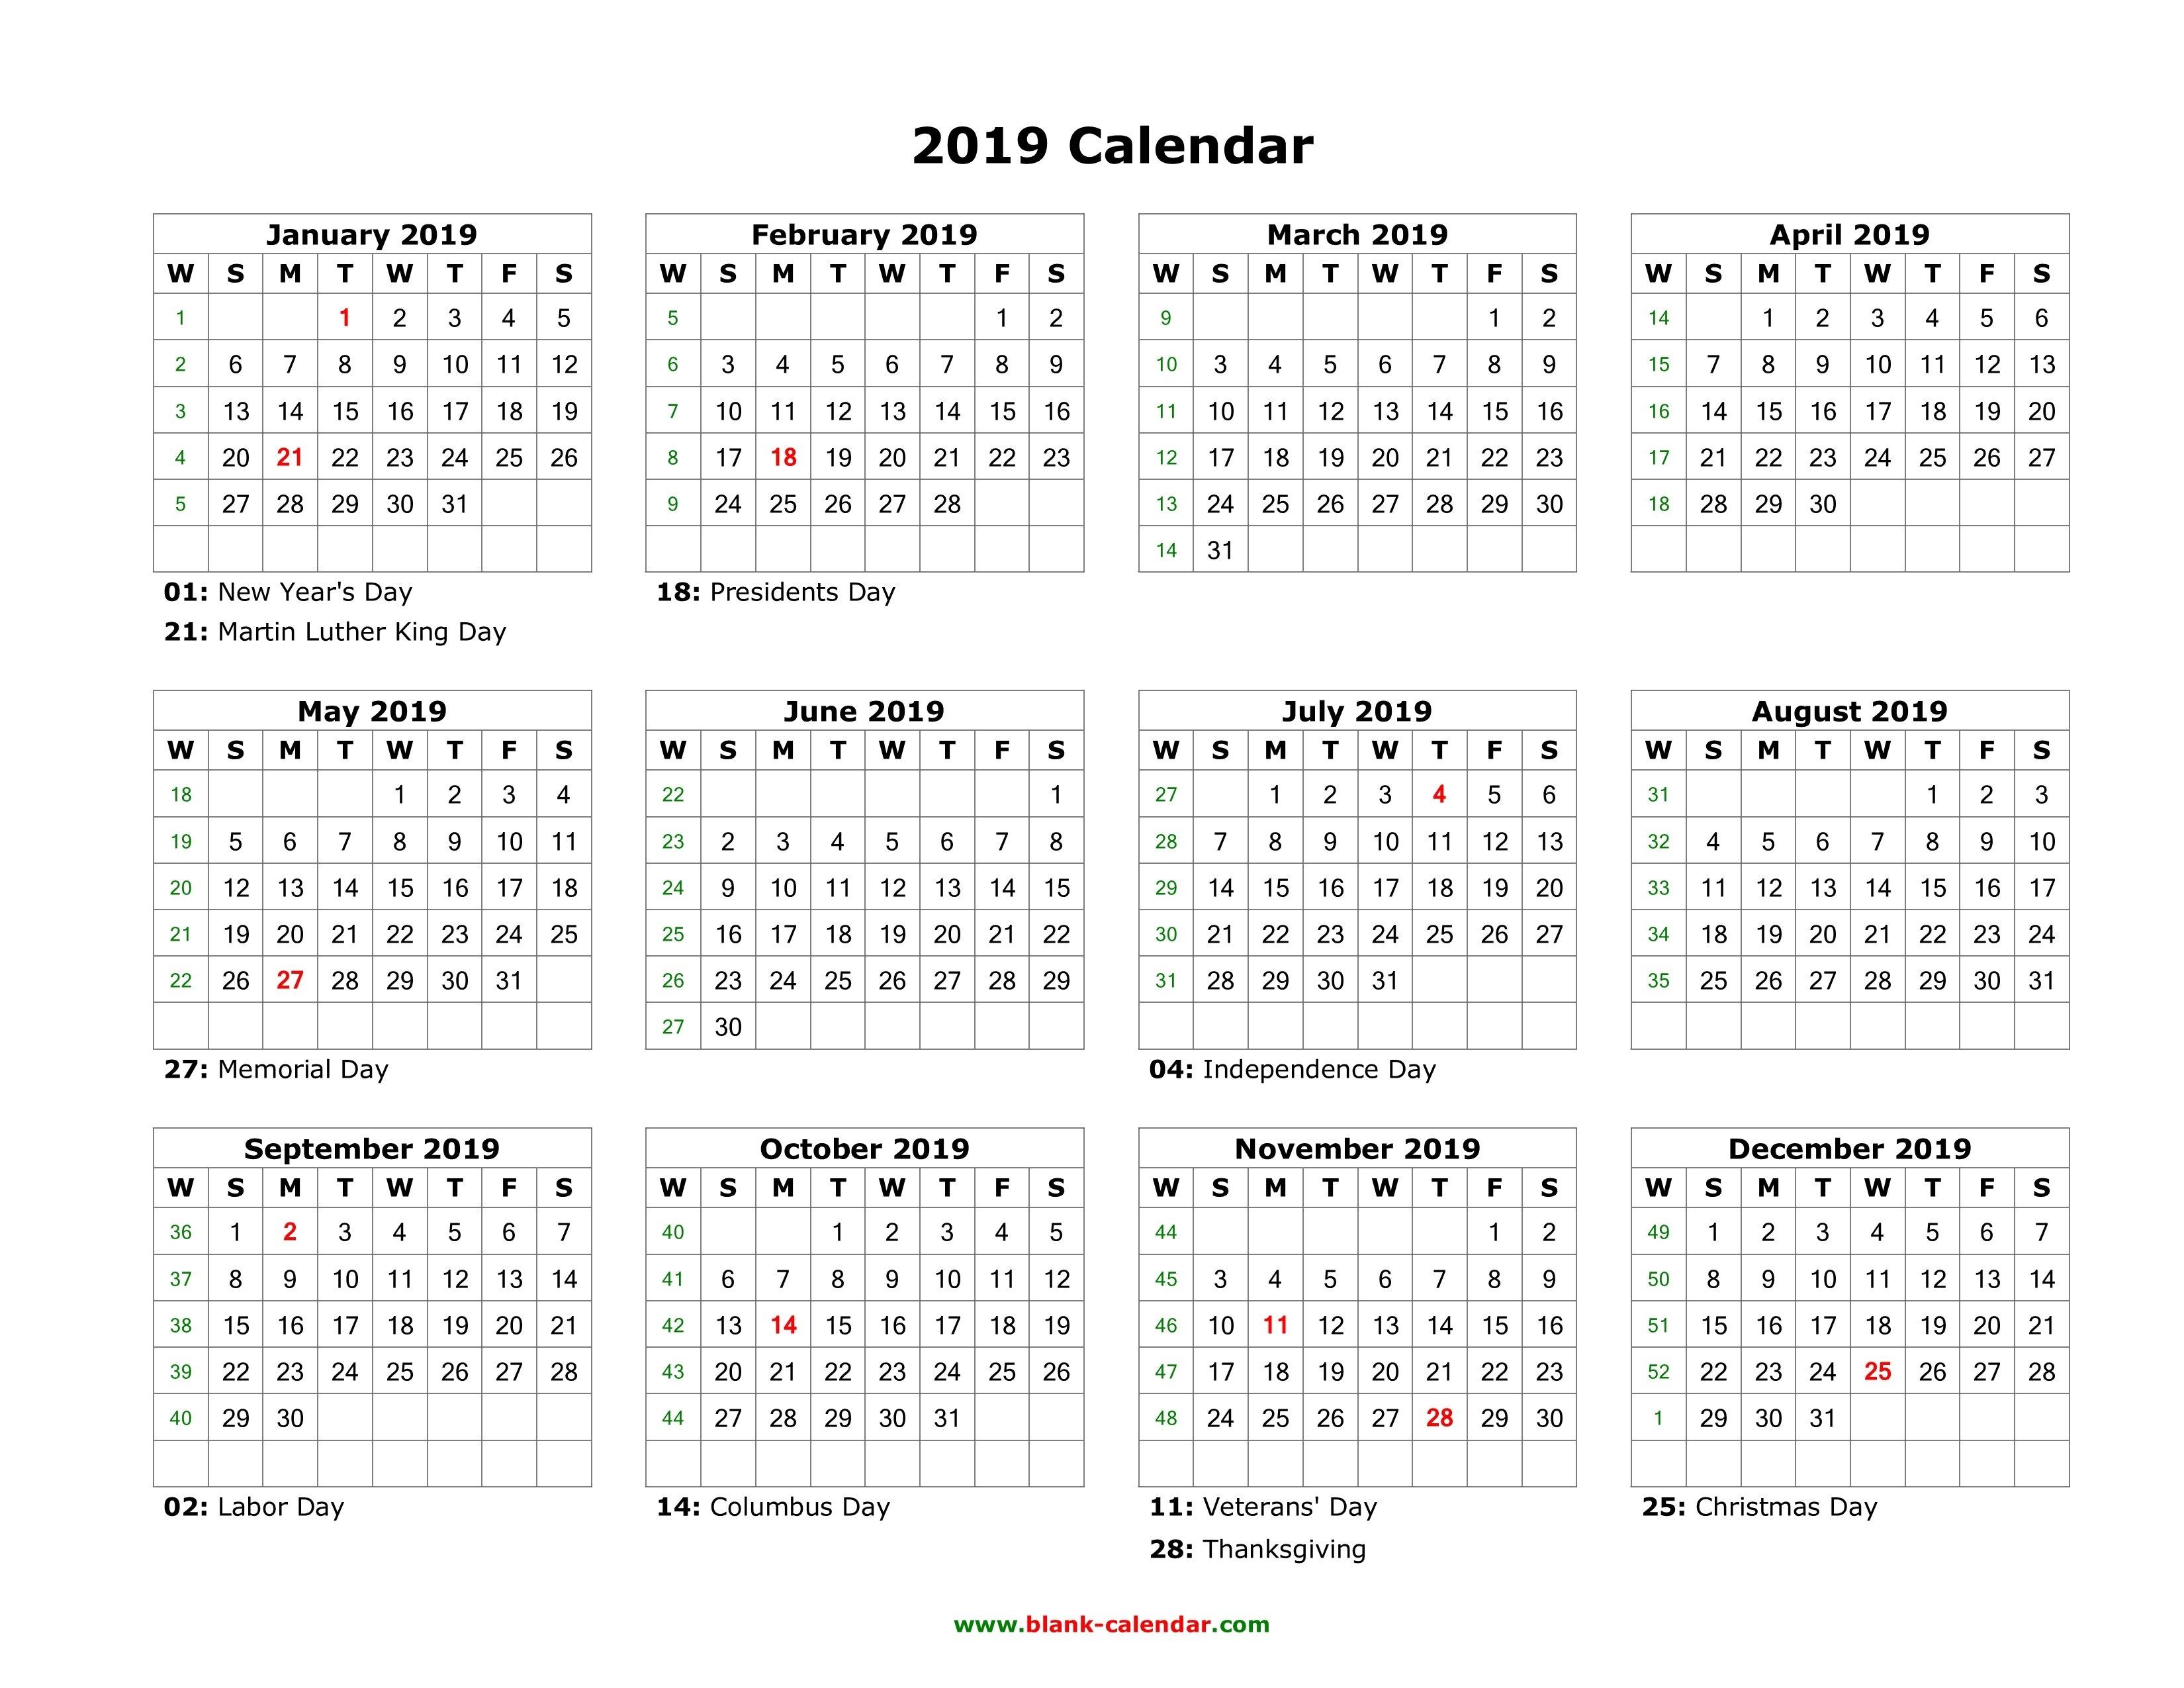 Blank Calendar 2019 | Free Download Calendar Templates 1 Year Calendar 2019